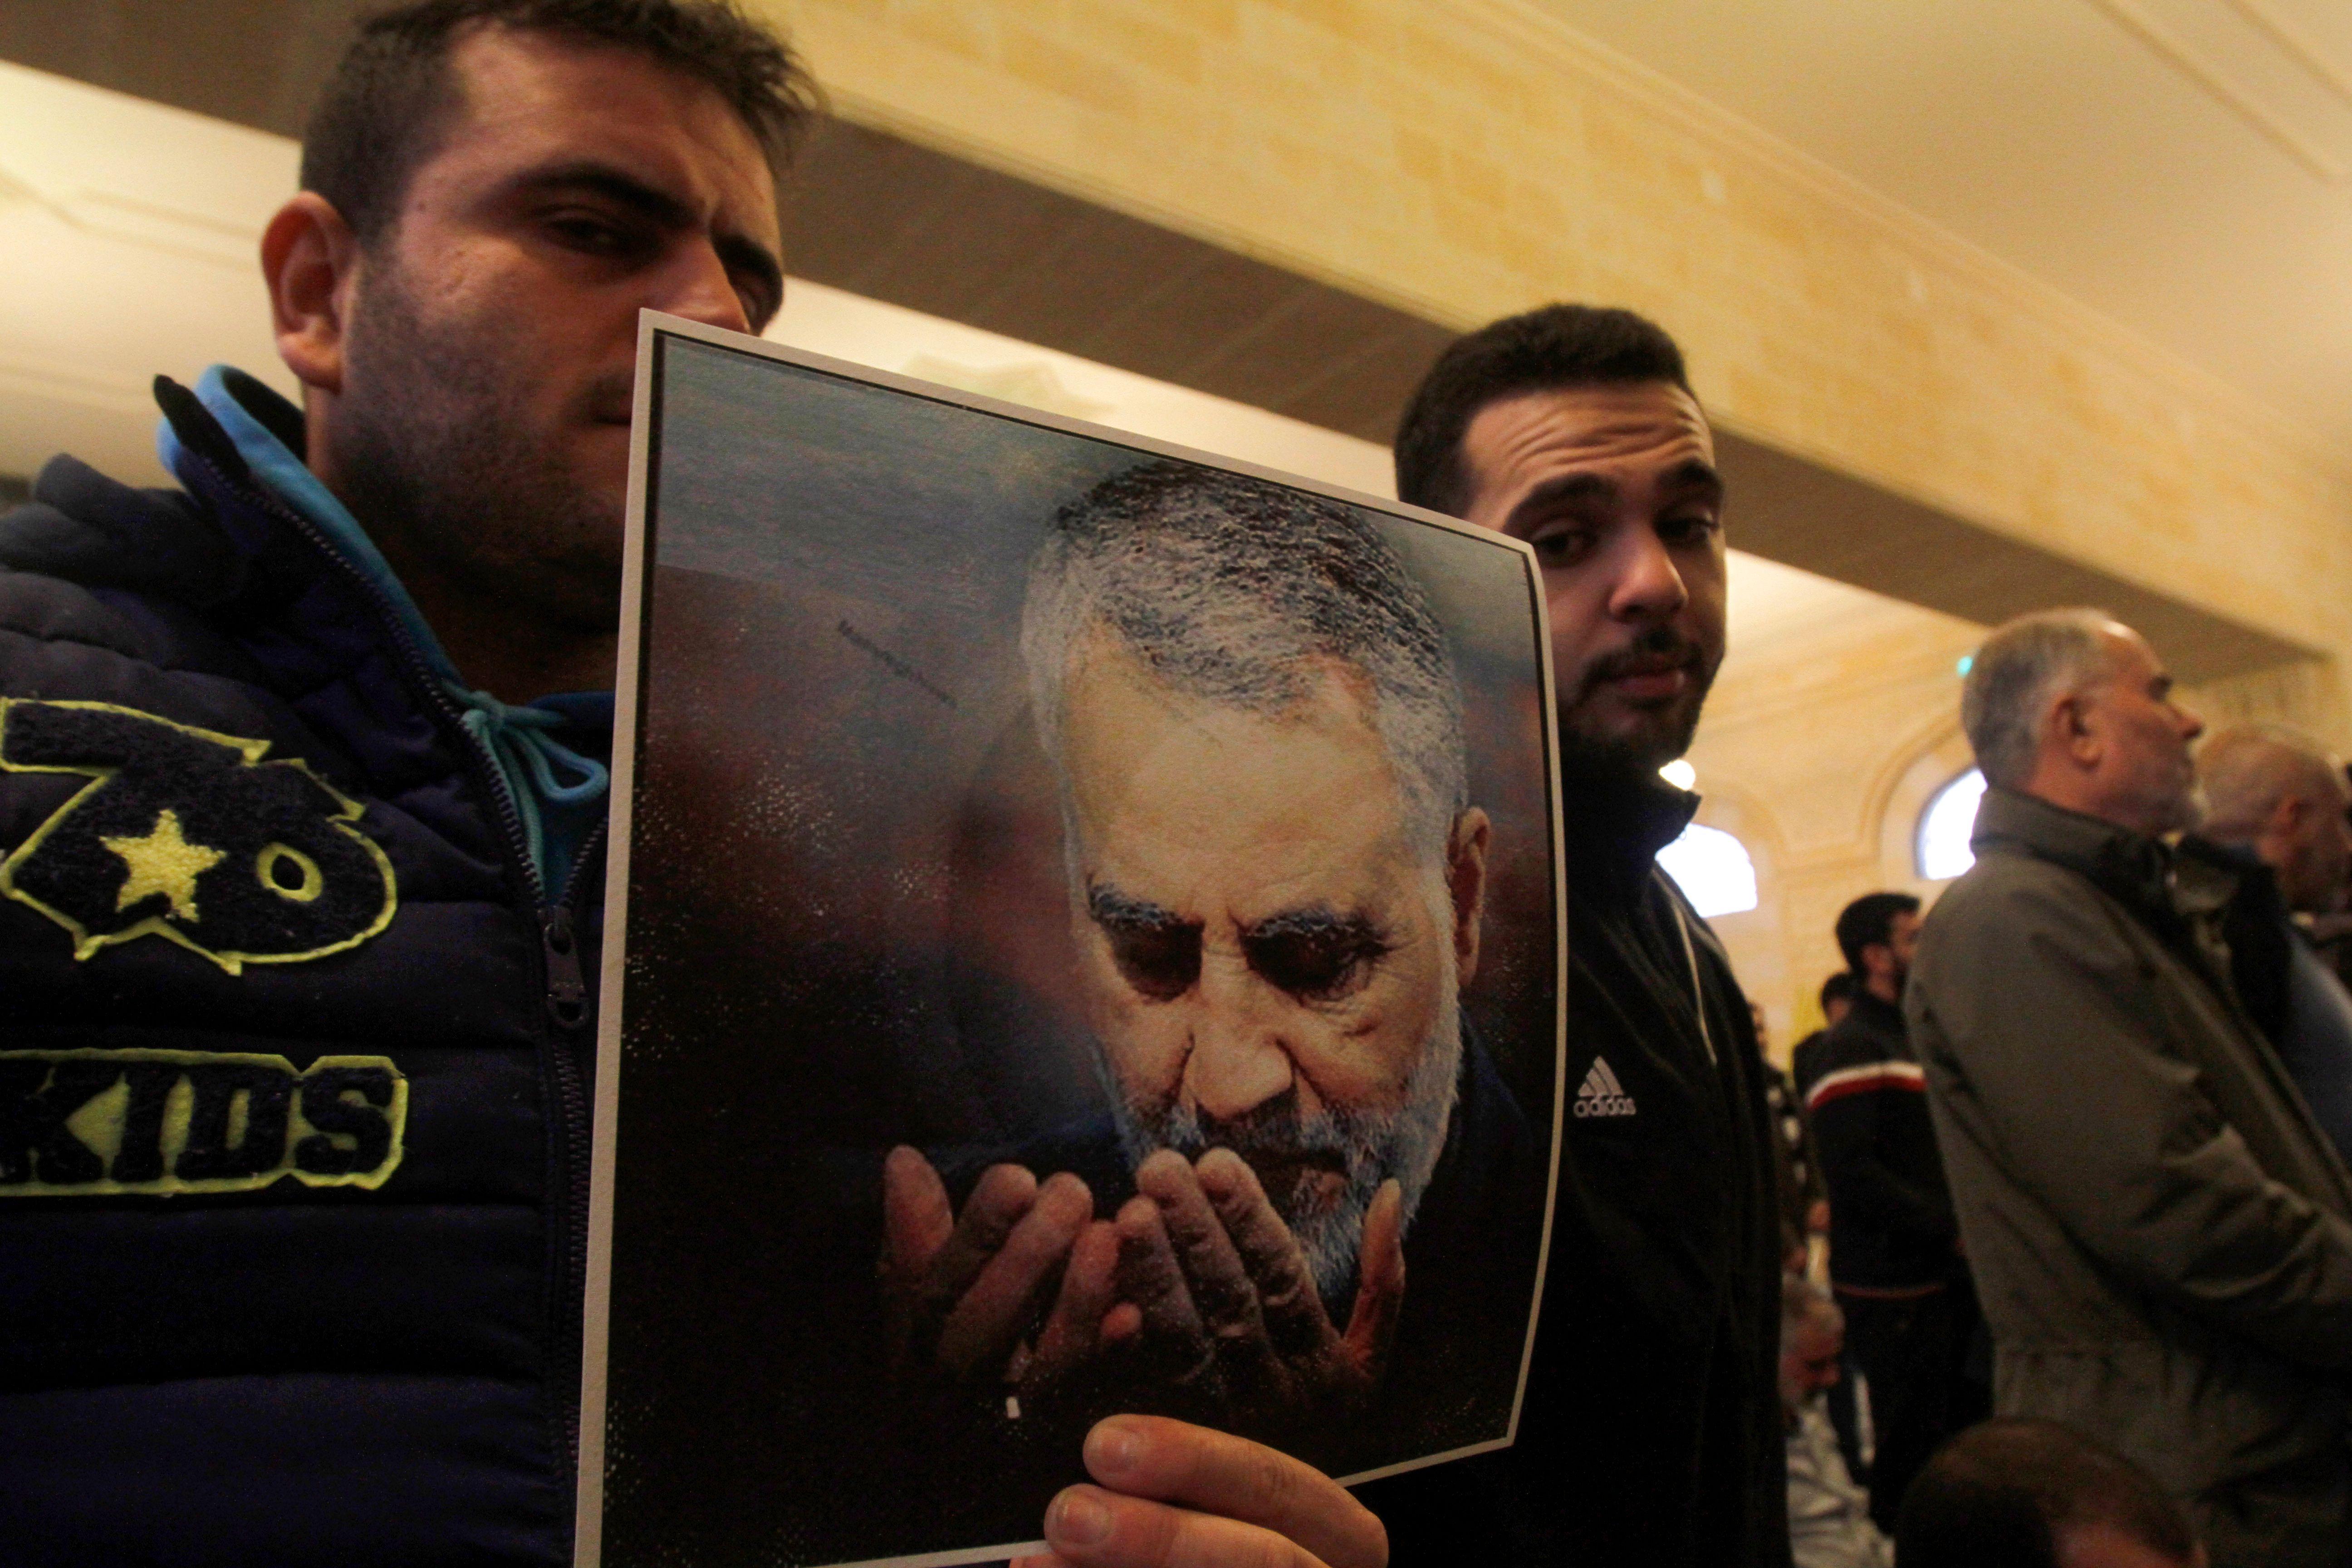 Photo by MAHMOUD ZAYYAT/AFP via Getty Images